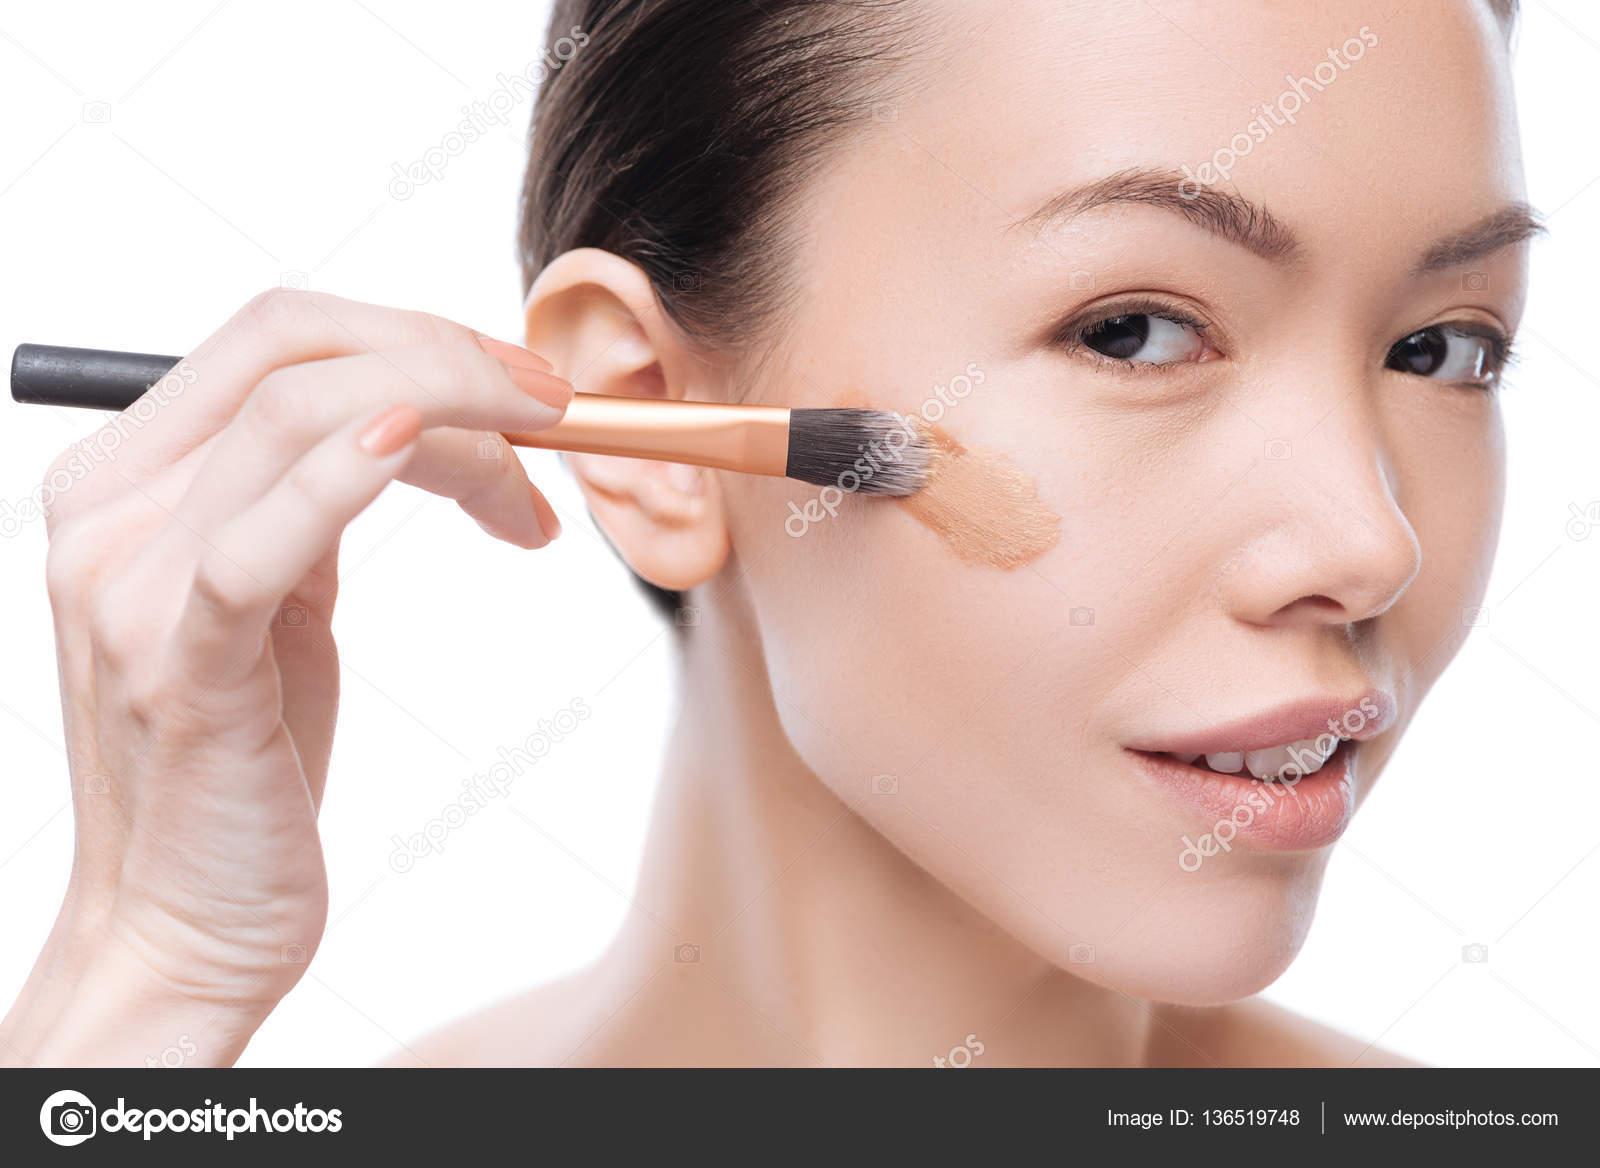 Feliz mujer positiva aplicando base maquillaje — Foto de Stock #136519748